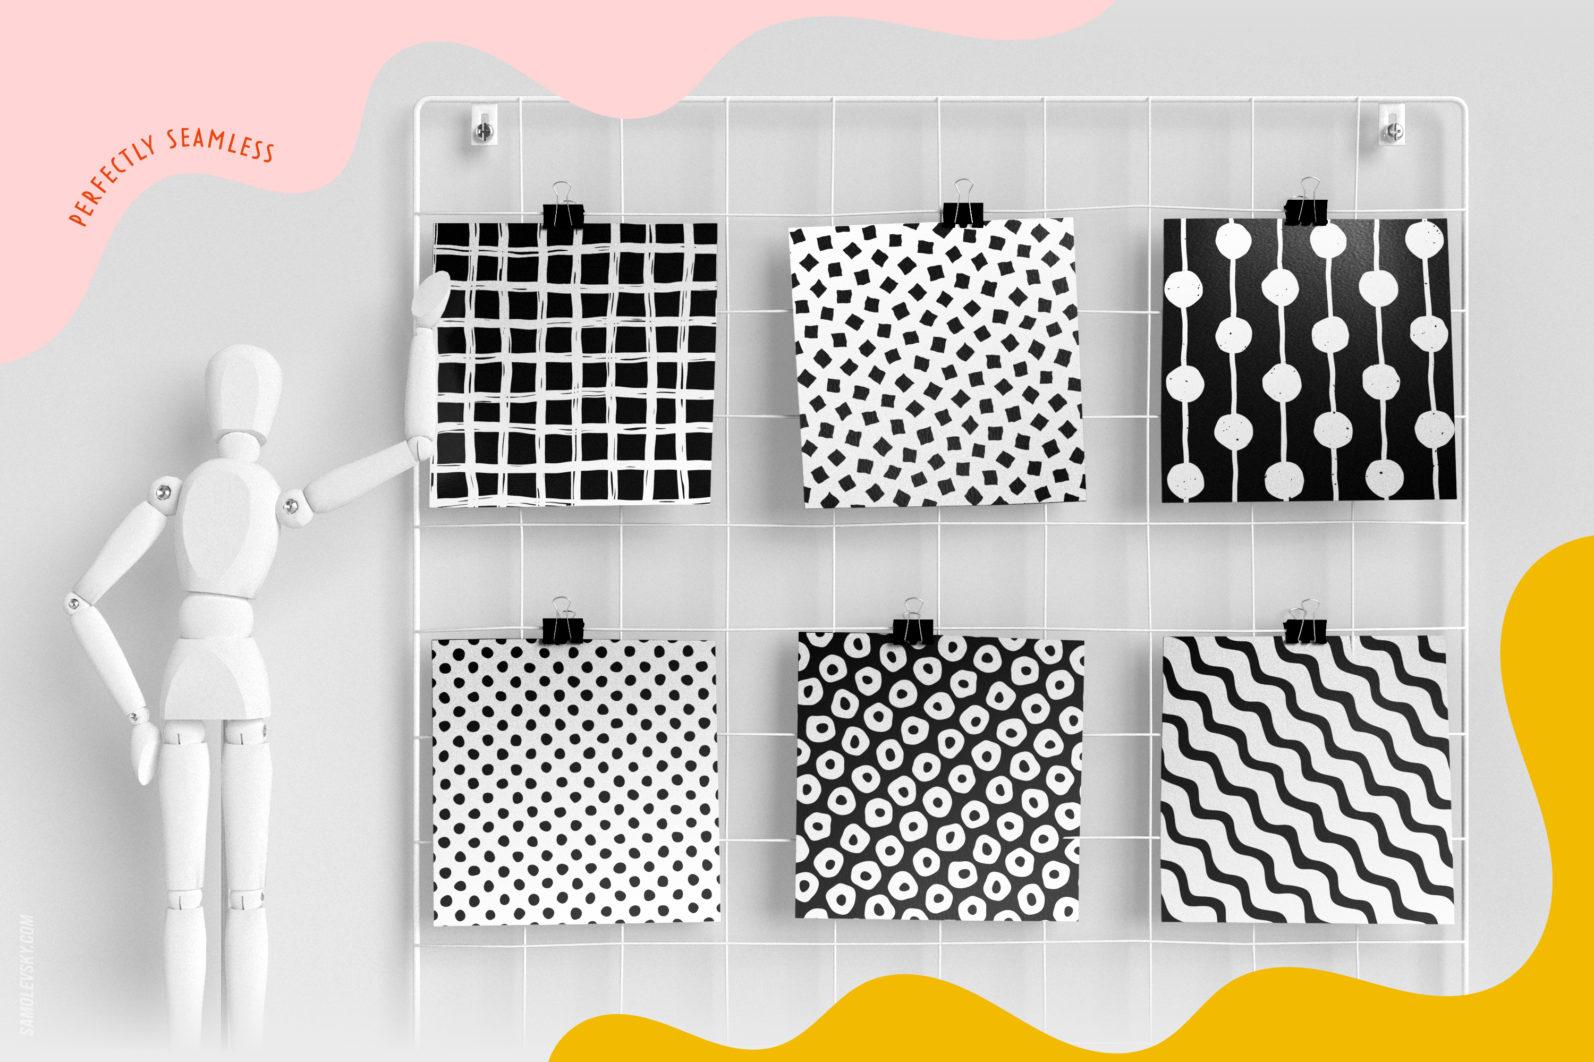 Handmade patterns bundle - 300 seamless patterns, brushes, and shapes - Samolevsky.com Handmade patterns bundle 06 scaled -